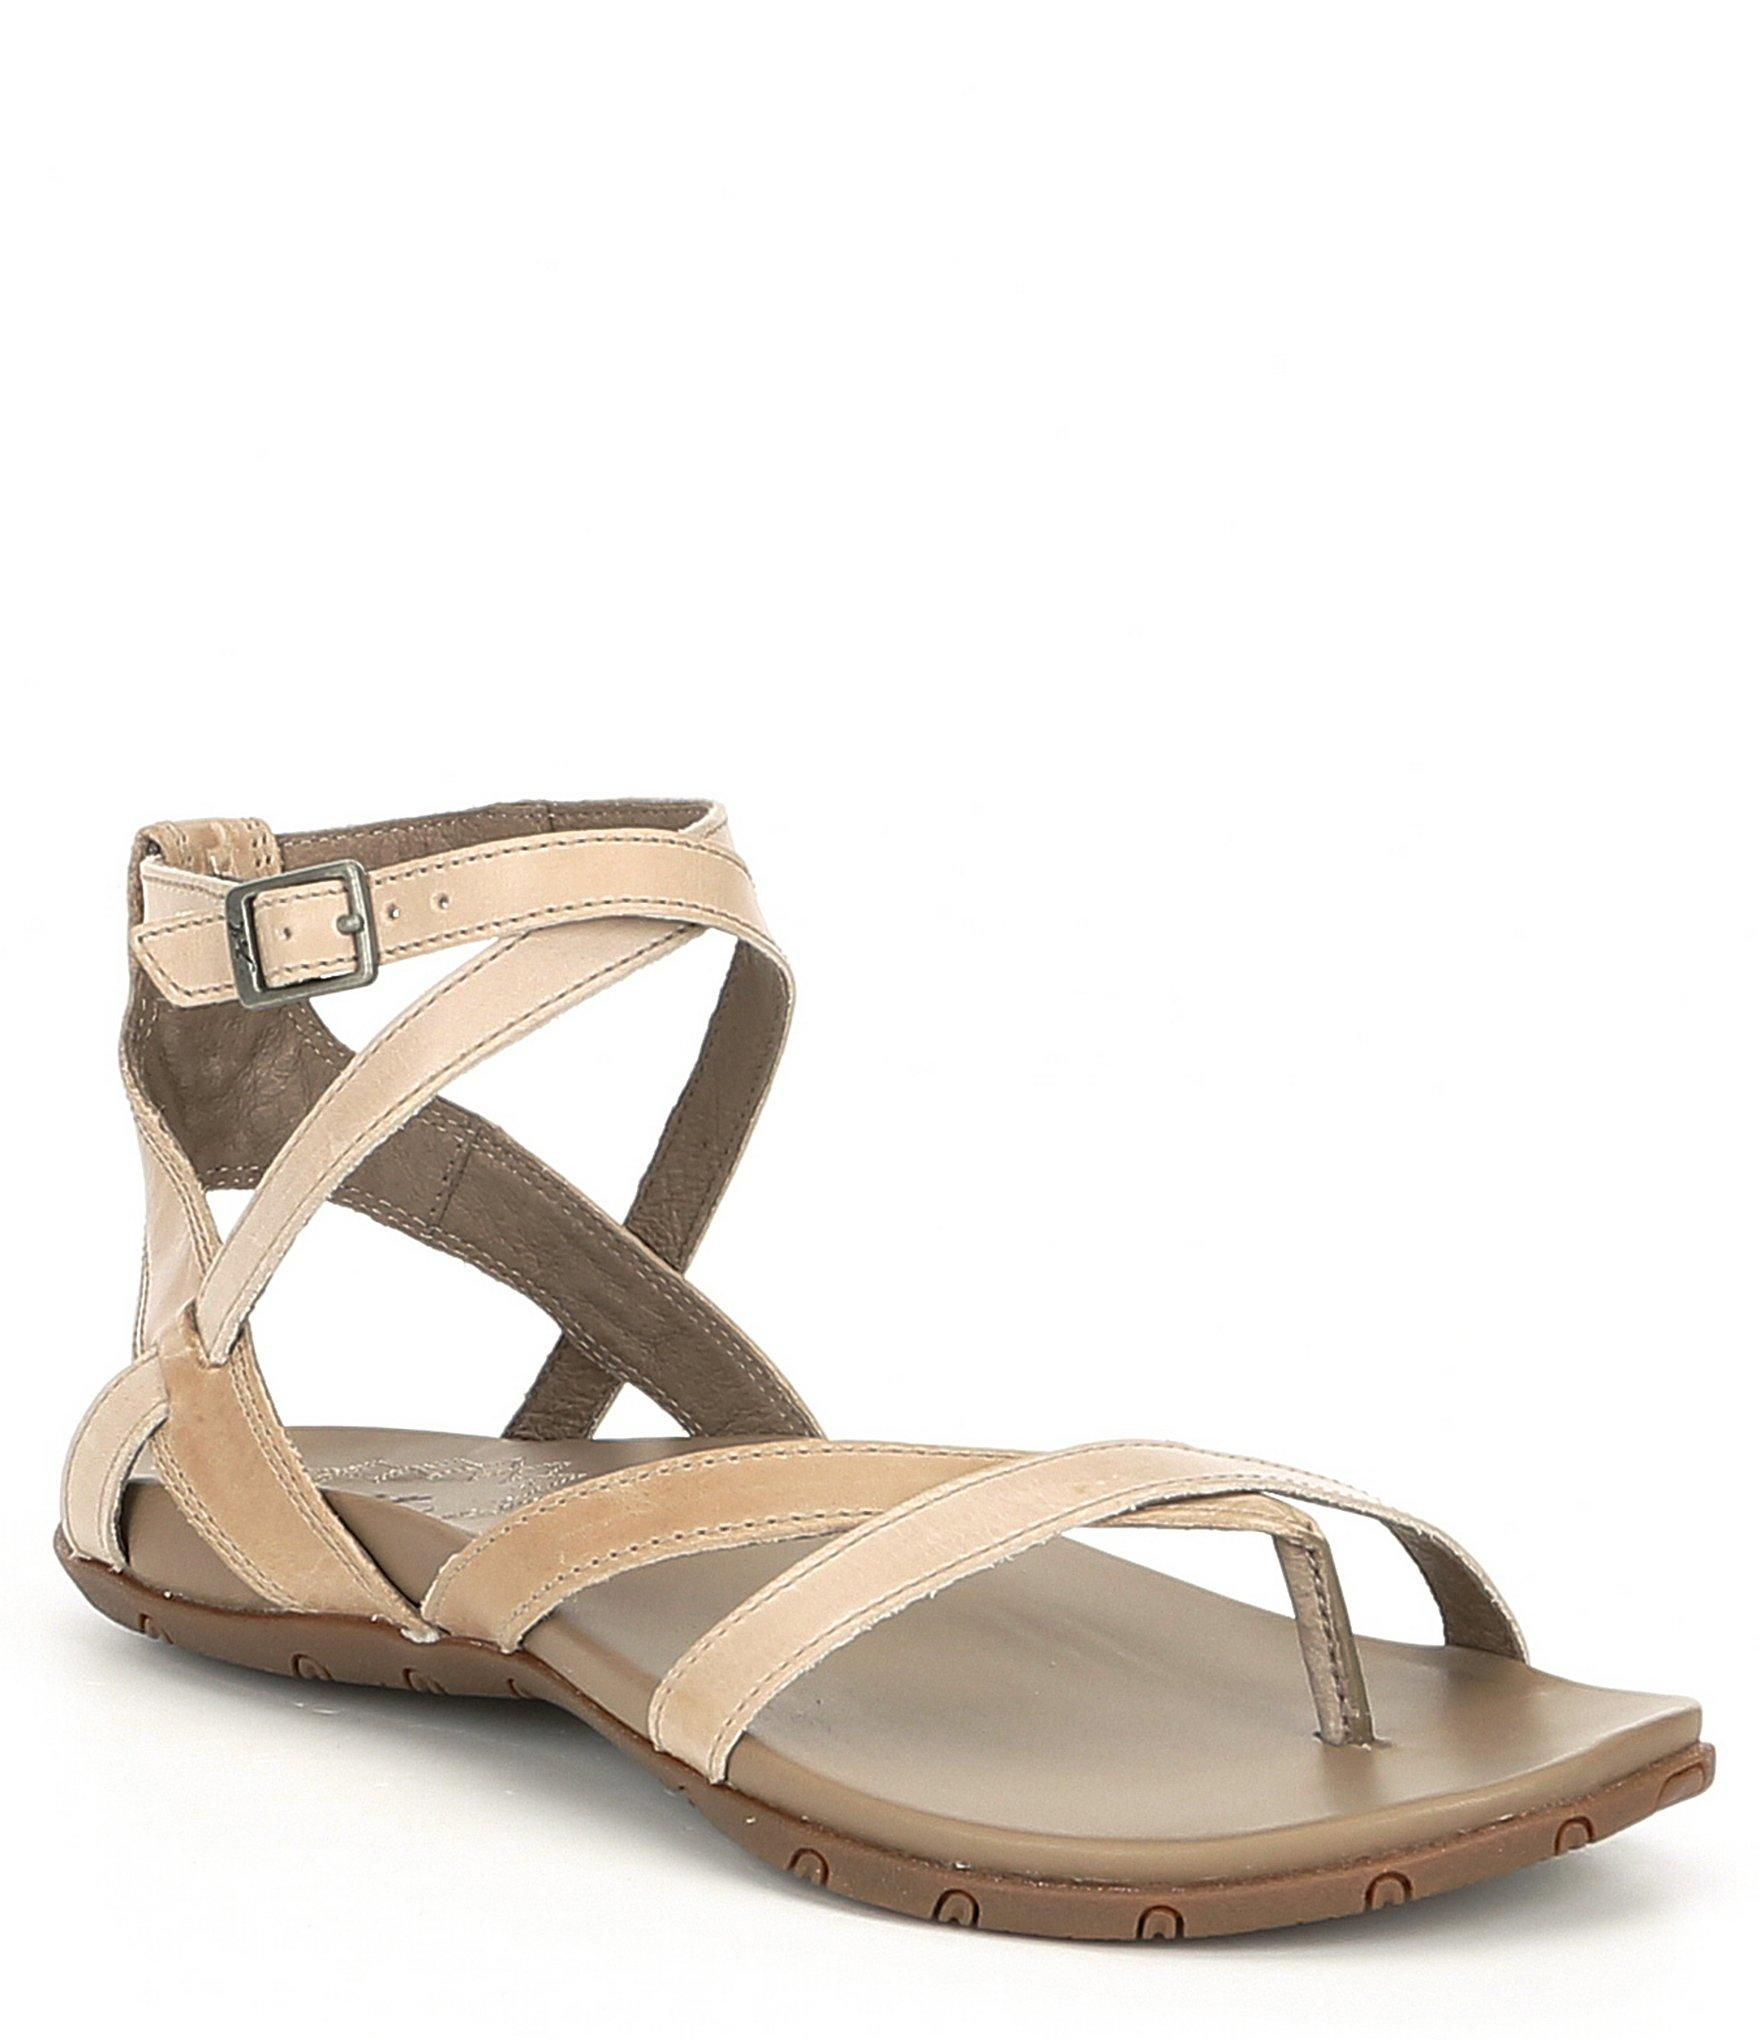 6d3e708a3fb7 Chaco. Women s Juniper Leather Sandals